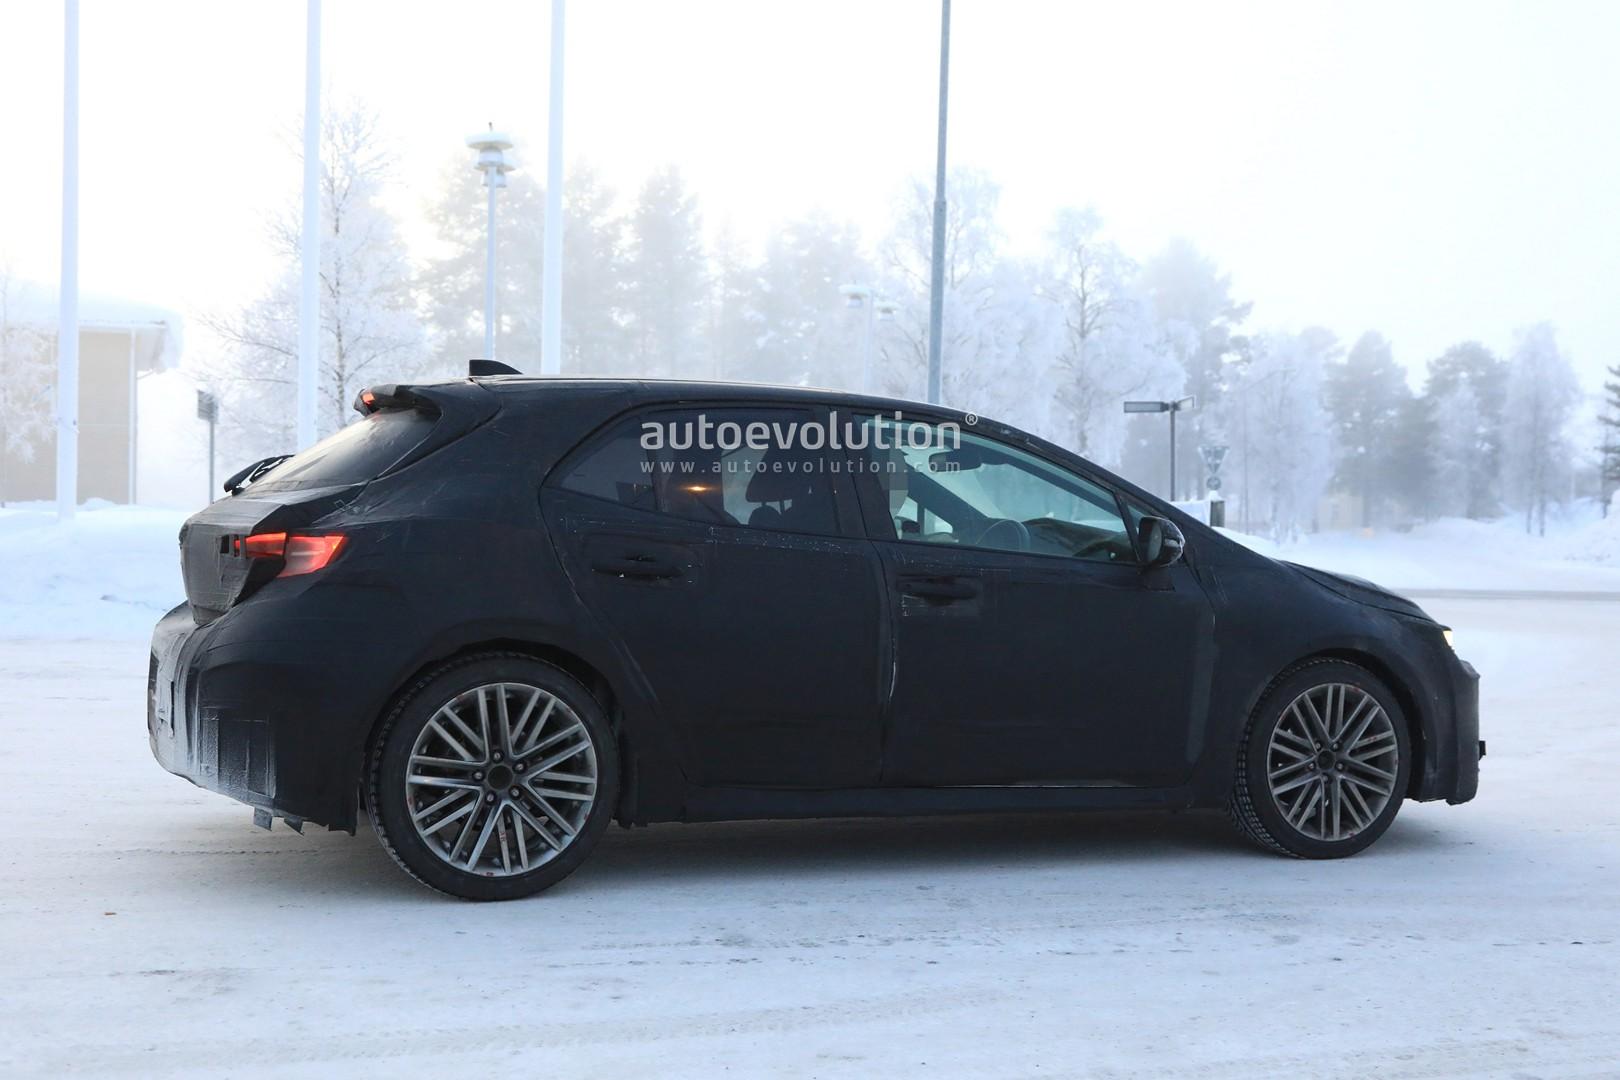 Toyota Vin Decoder >> 2019 Toyota Auris Reveals New Interior and Angular Design ...